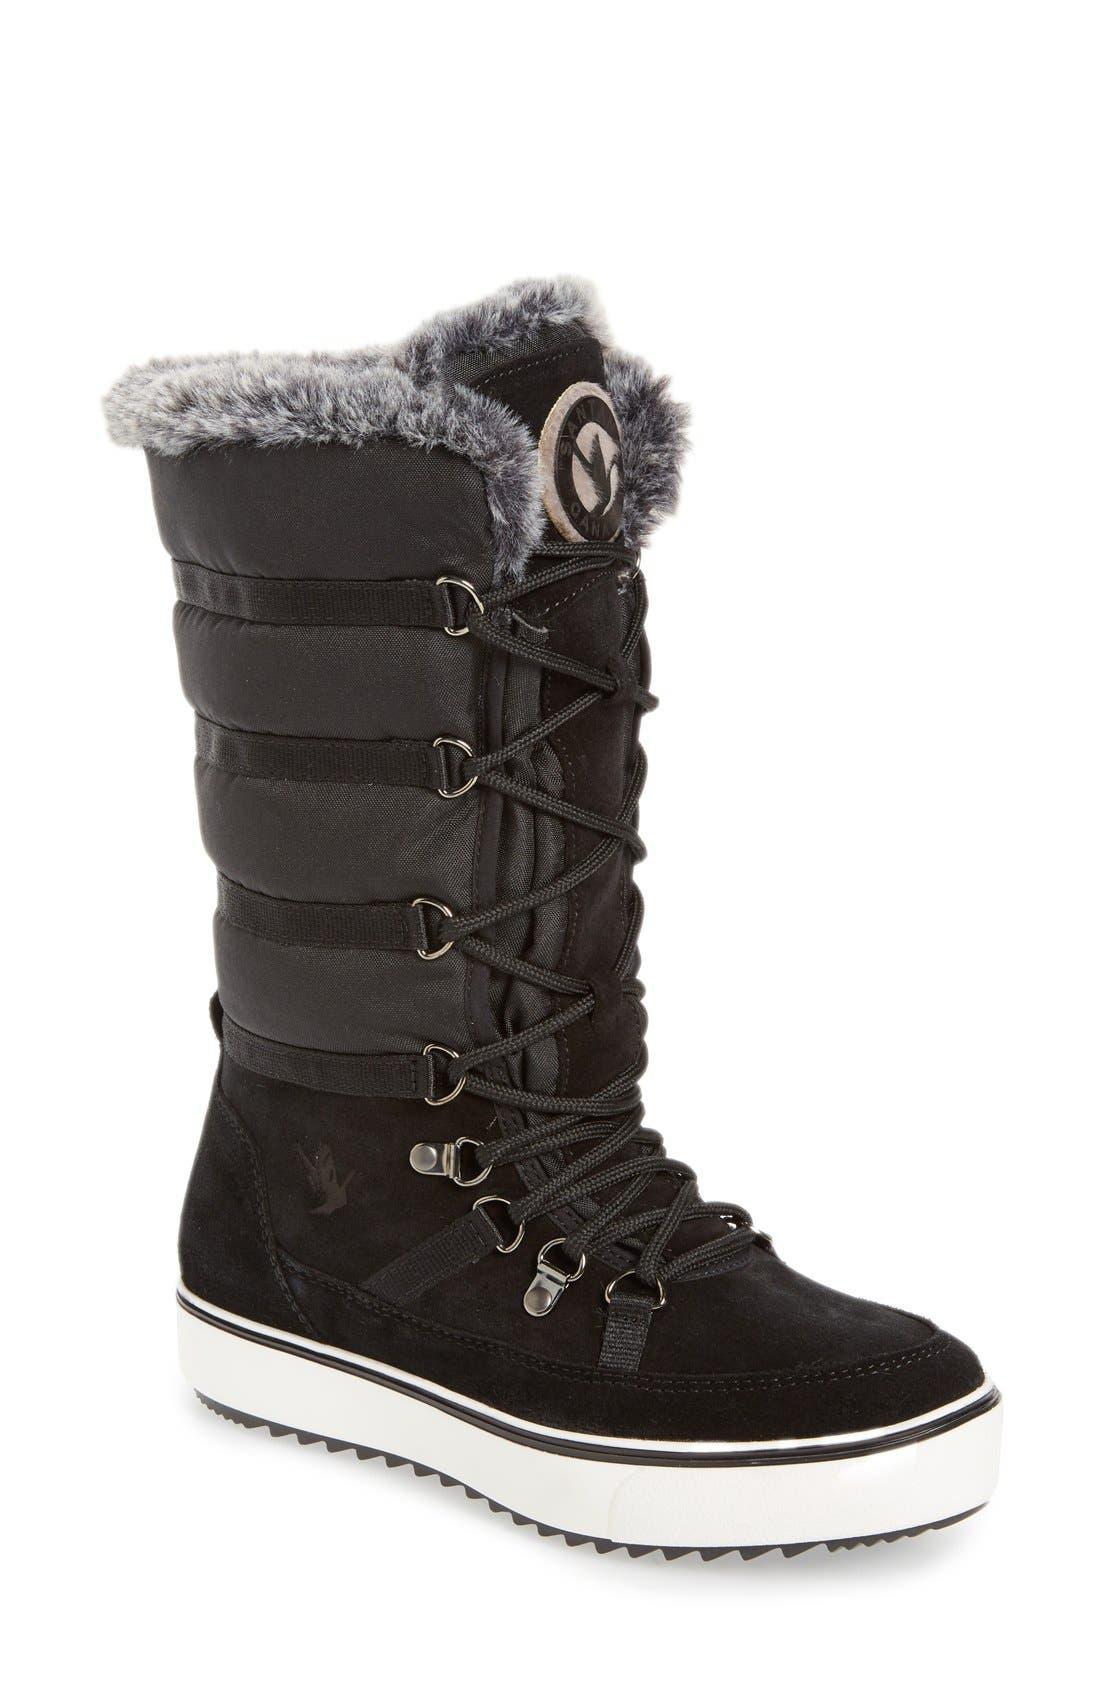 Main Image - Santana Canada 'Mackenzie' Faux Fur Waterproof Boot (Women)